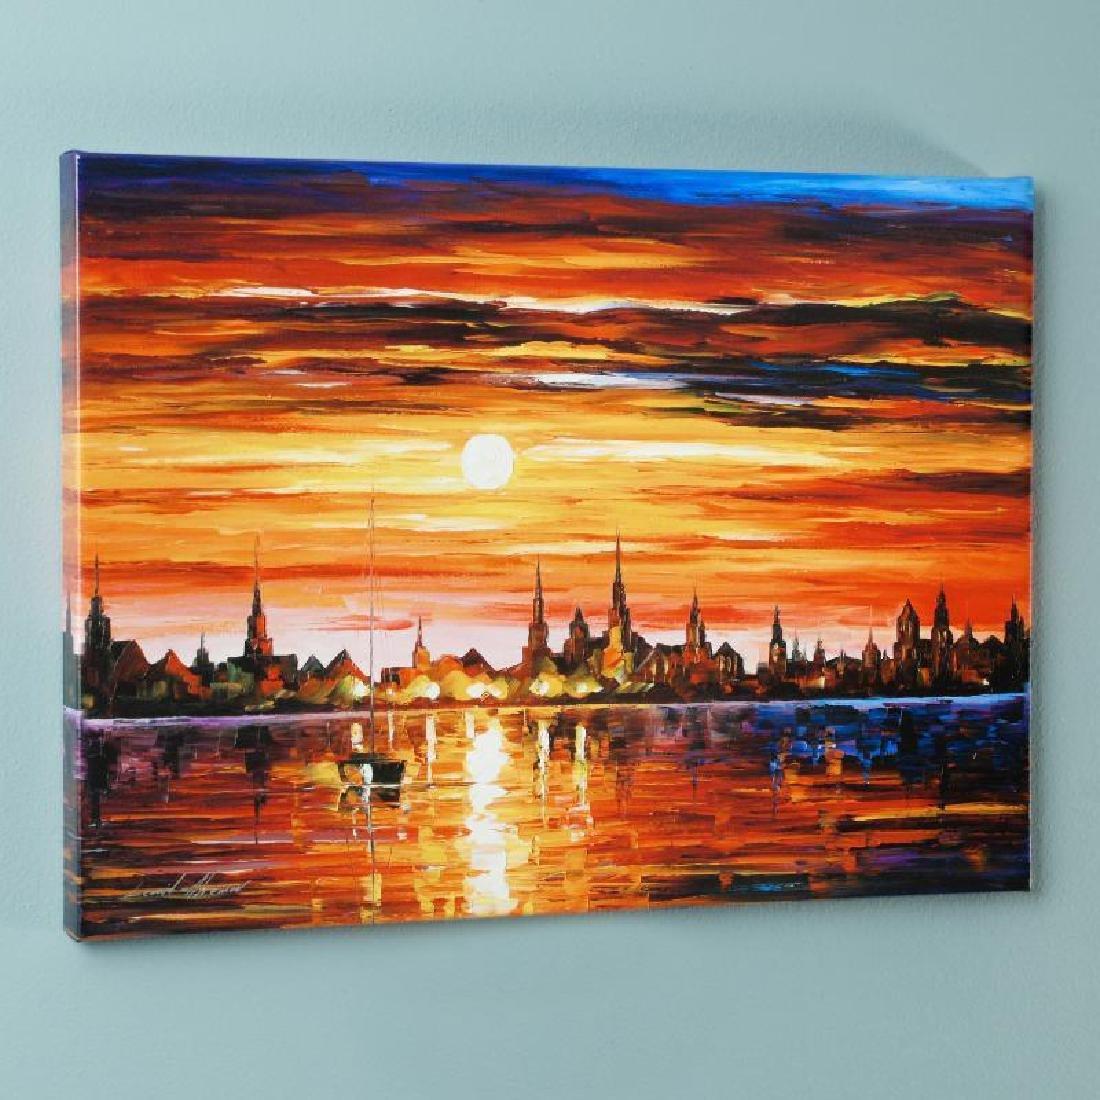 Sunset in Barcelona by Afremov, Leonid - 3